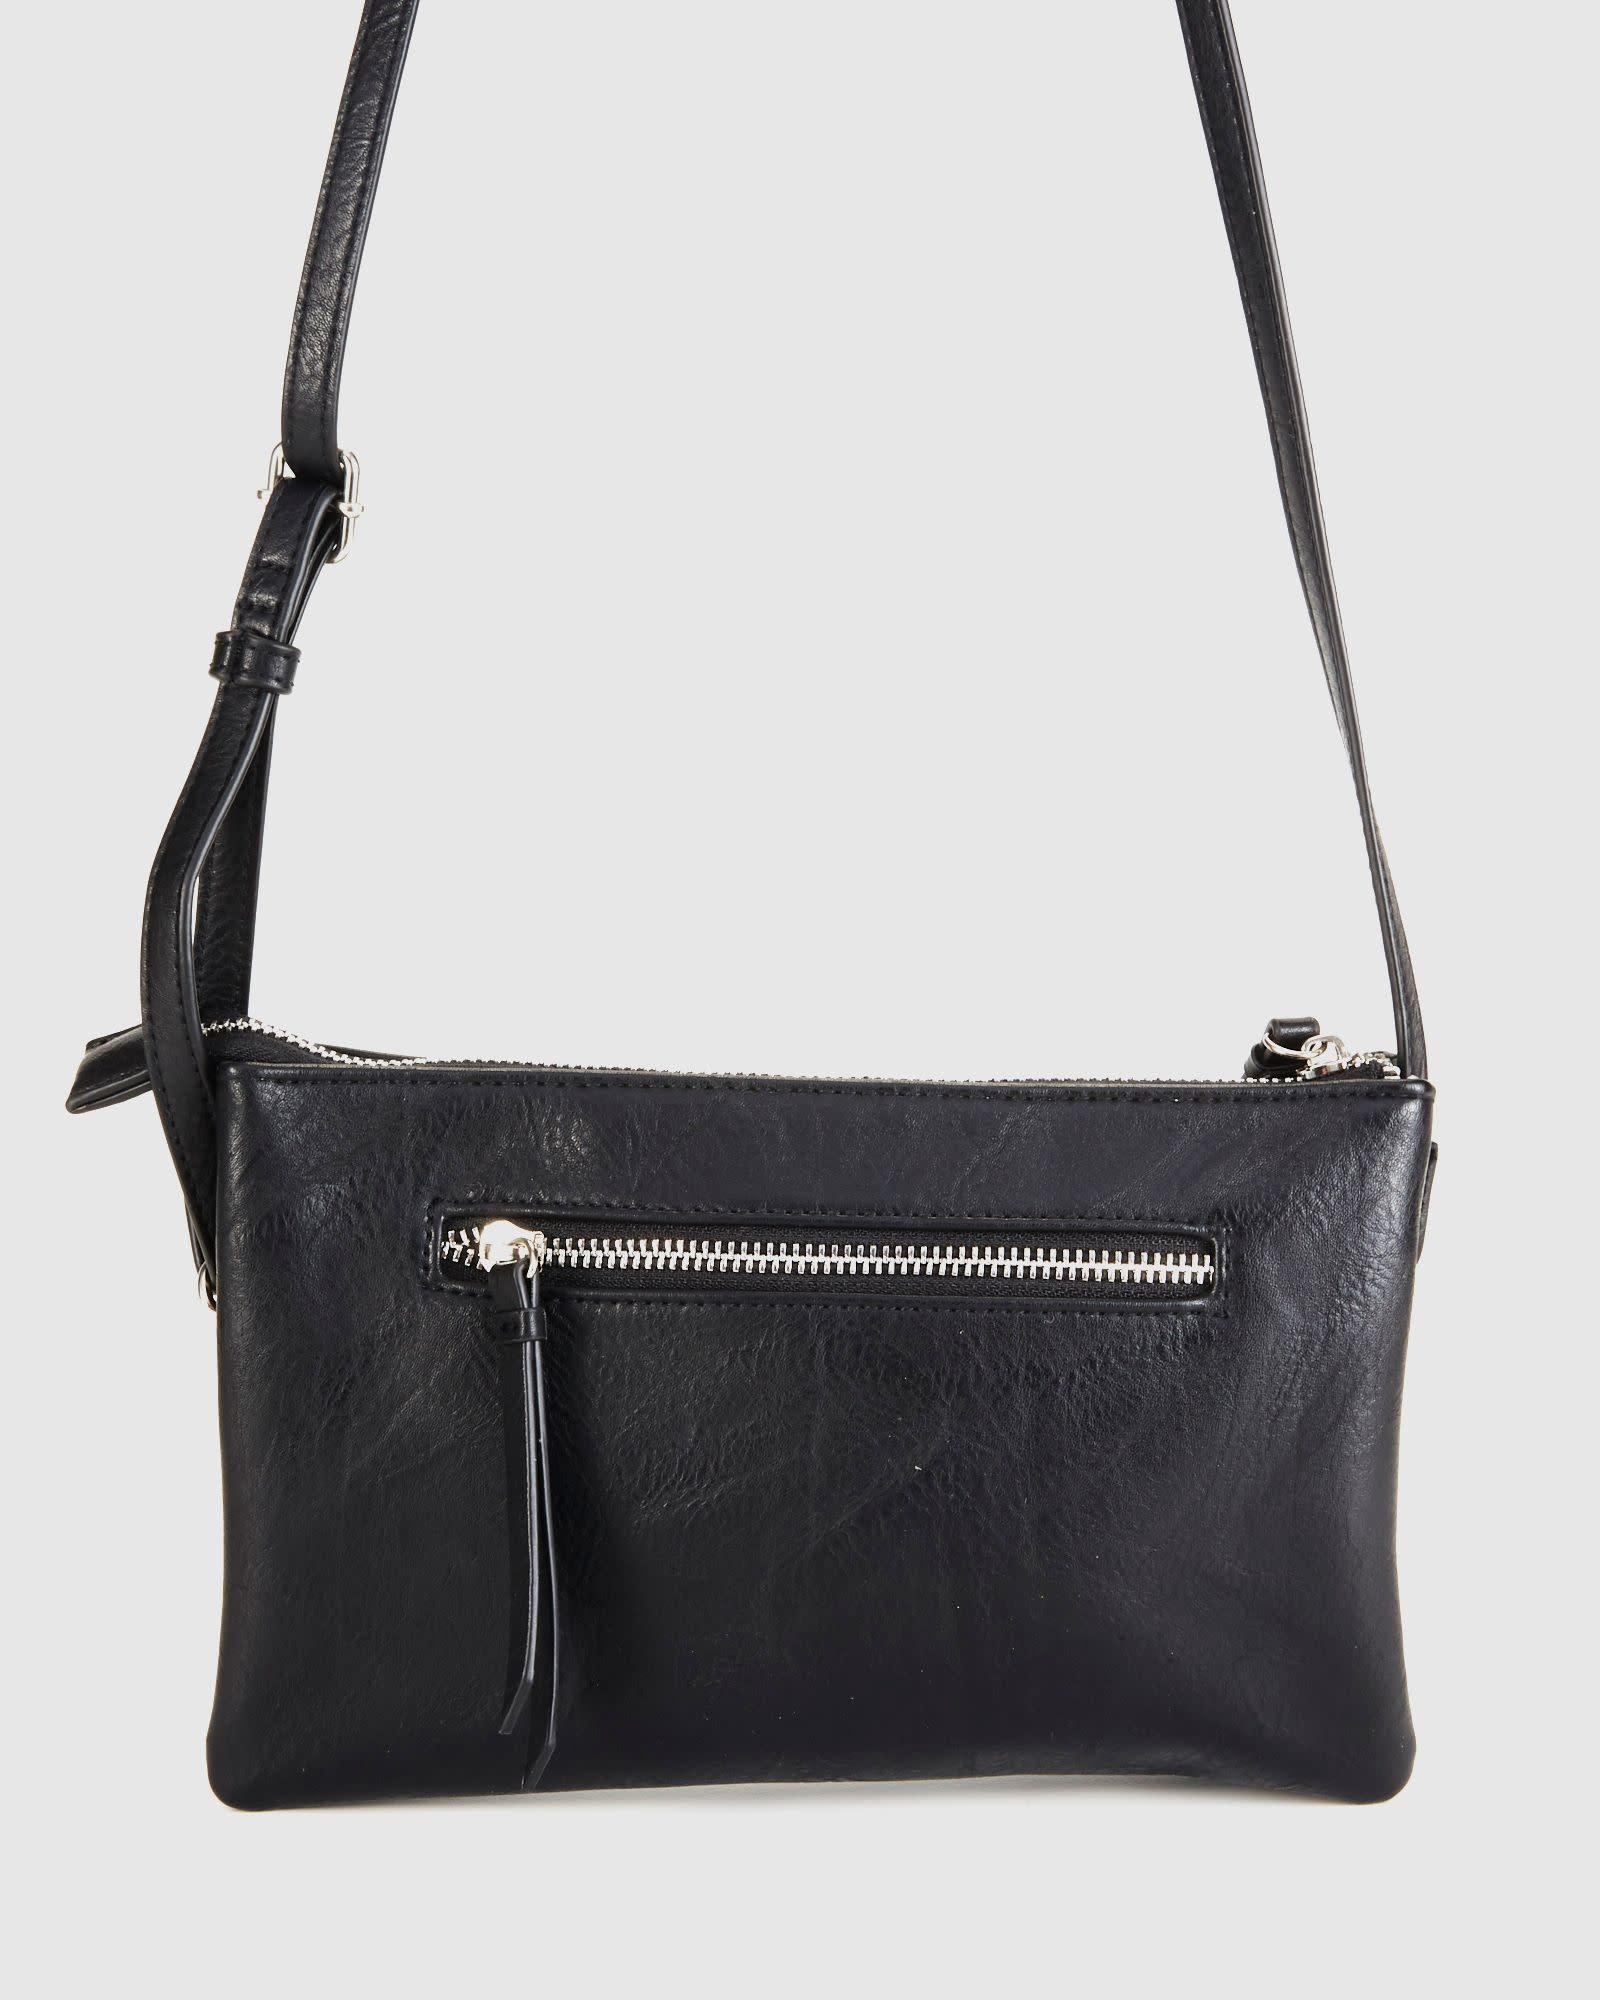 Tony Bianco Jonas Crossbody bag